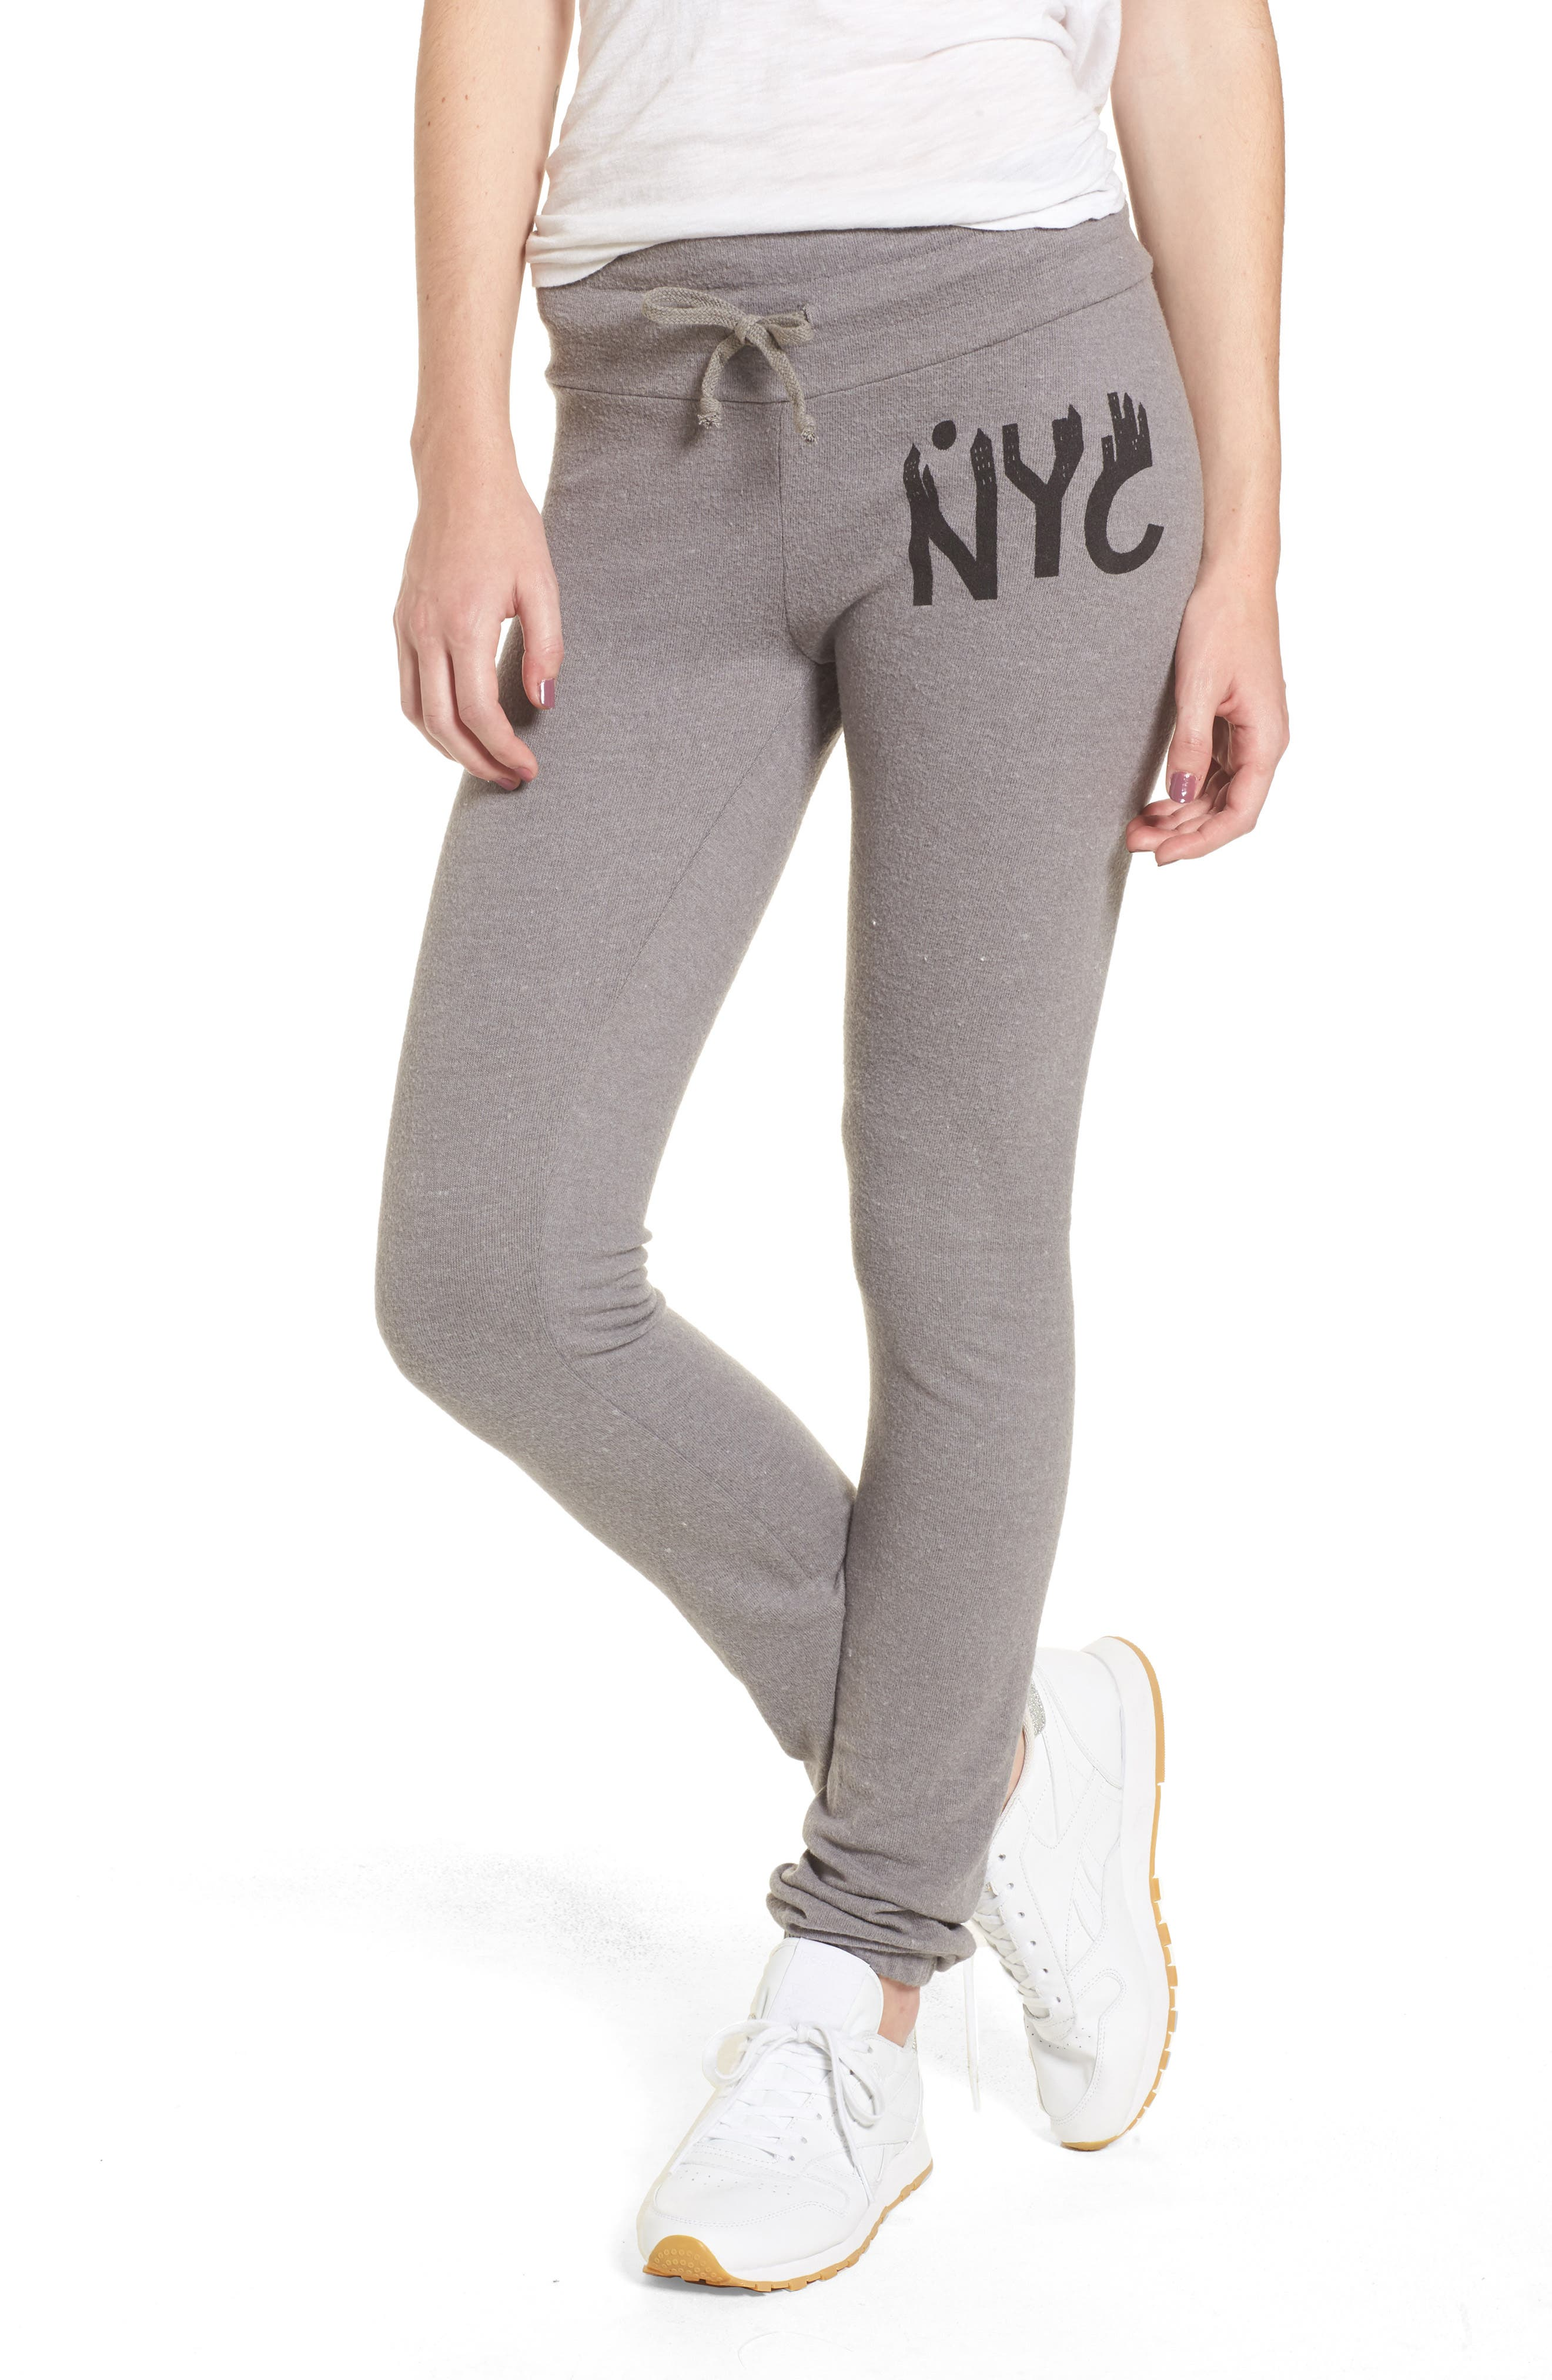 NYC Sweatpants,                         Main,                         color, 023